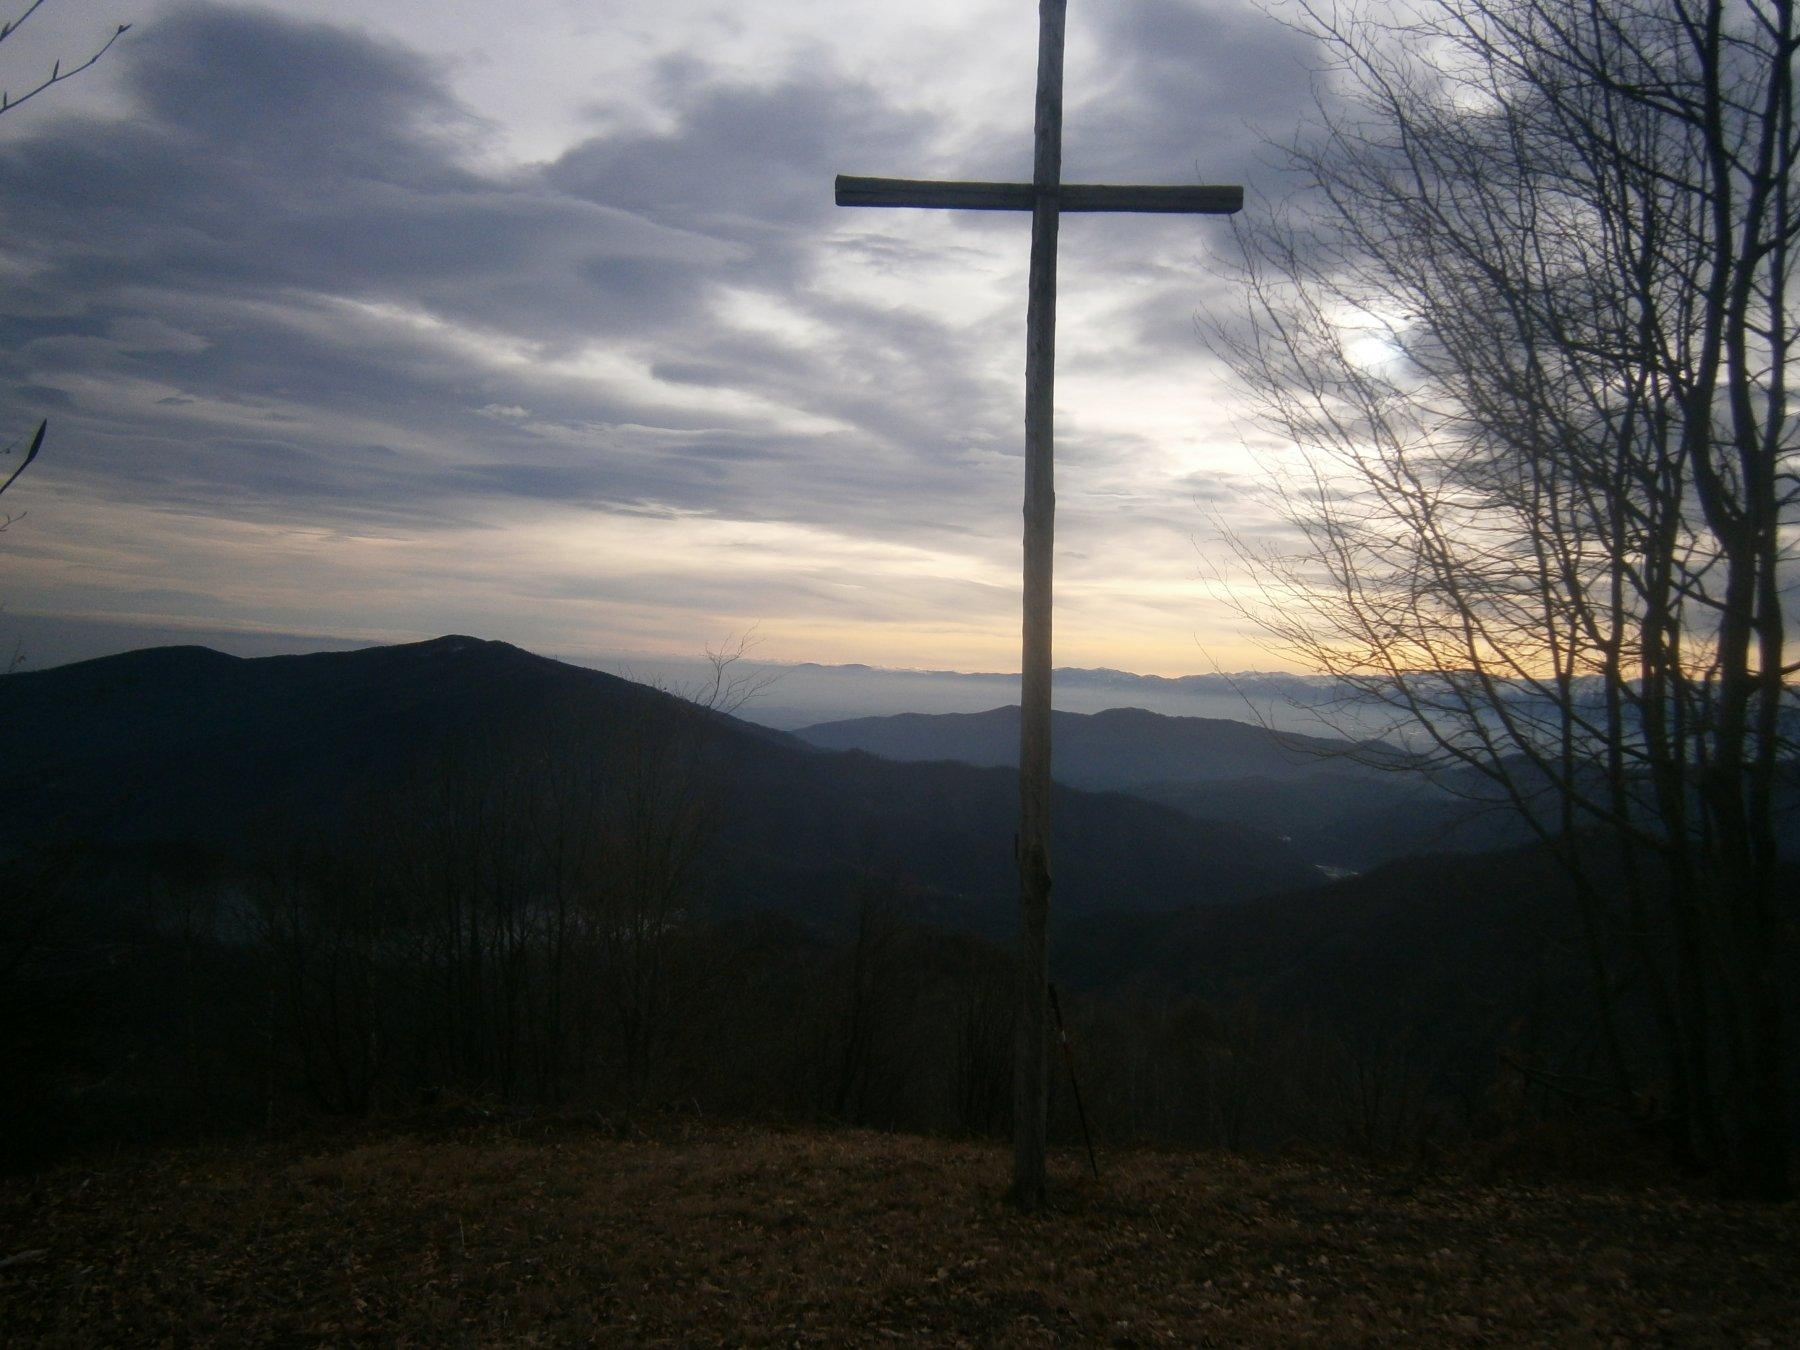 Croce lignea a quota 1170